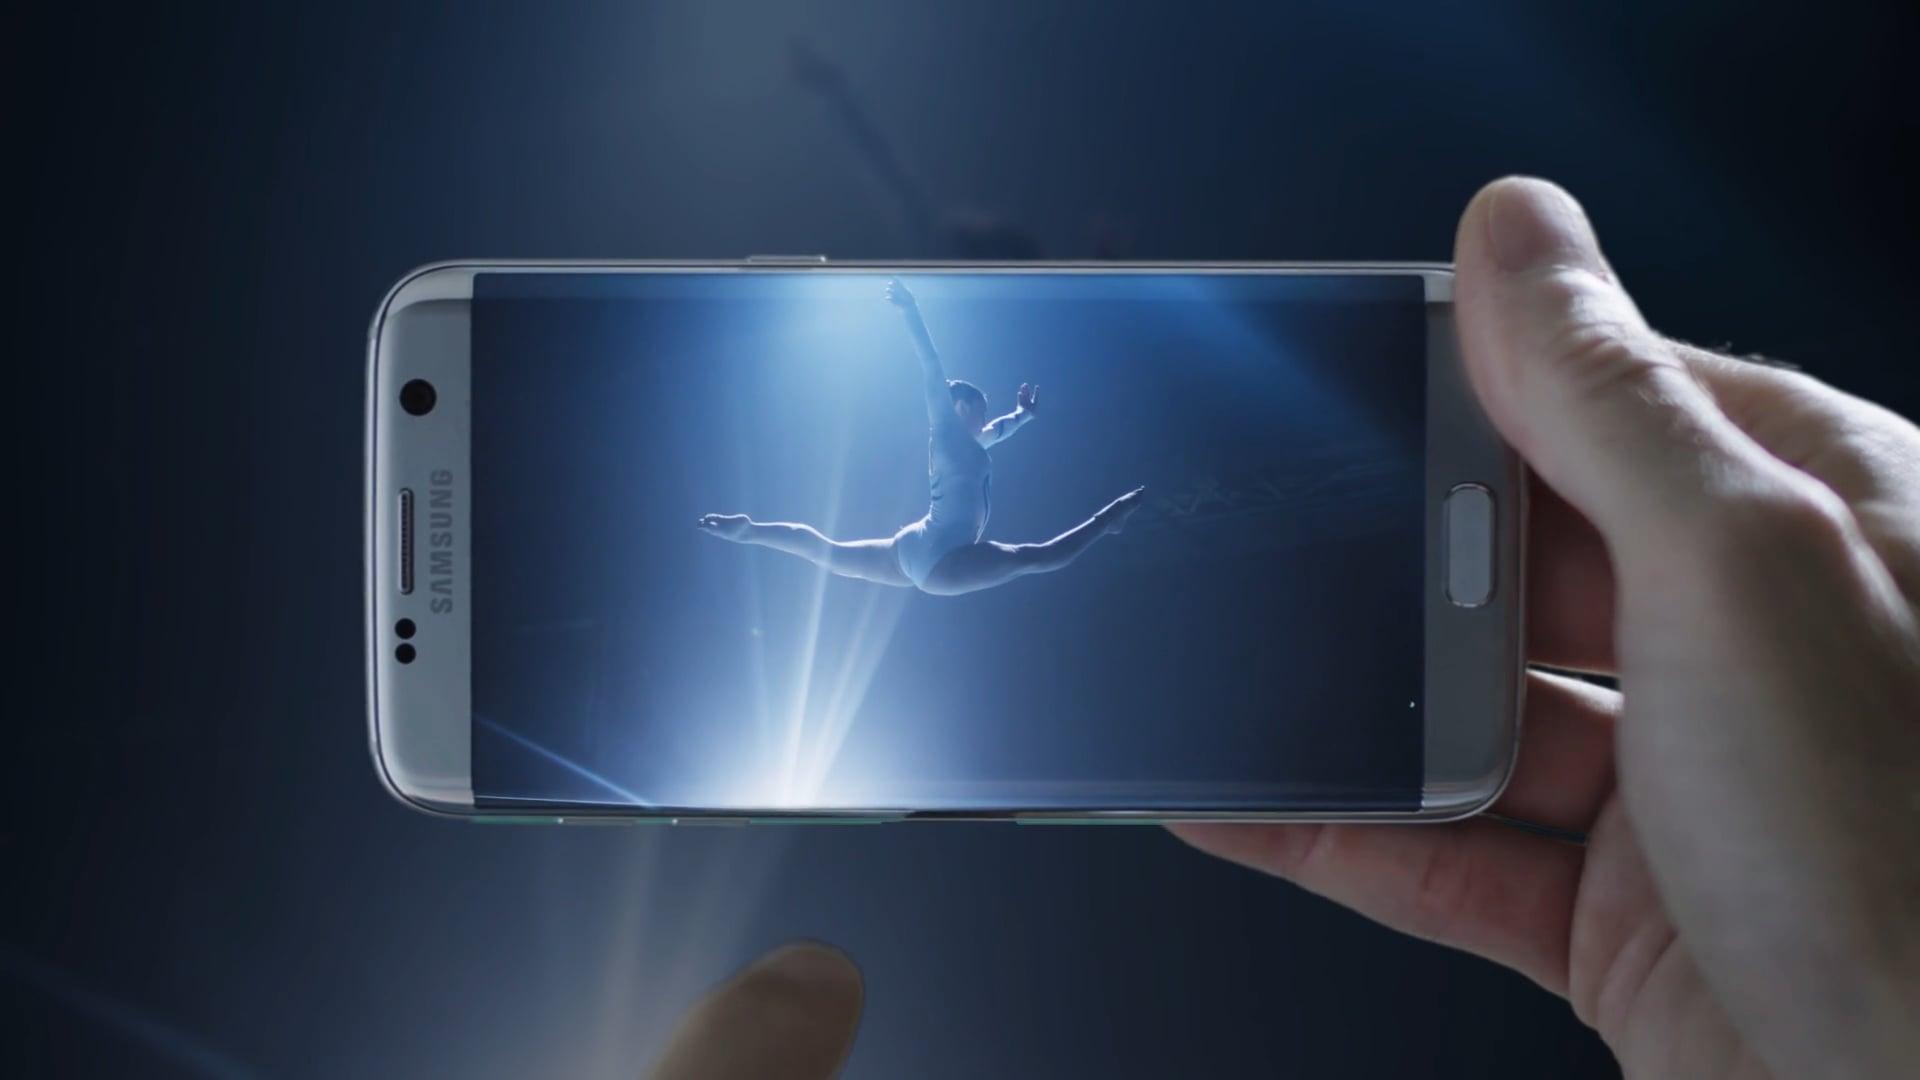 SENOL KORKMAZ DIRECTOR - Samsung_S7 Phone TVC